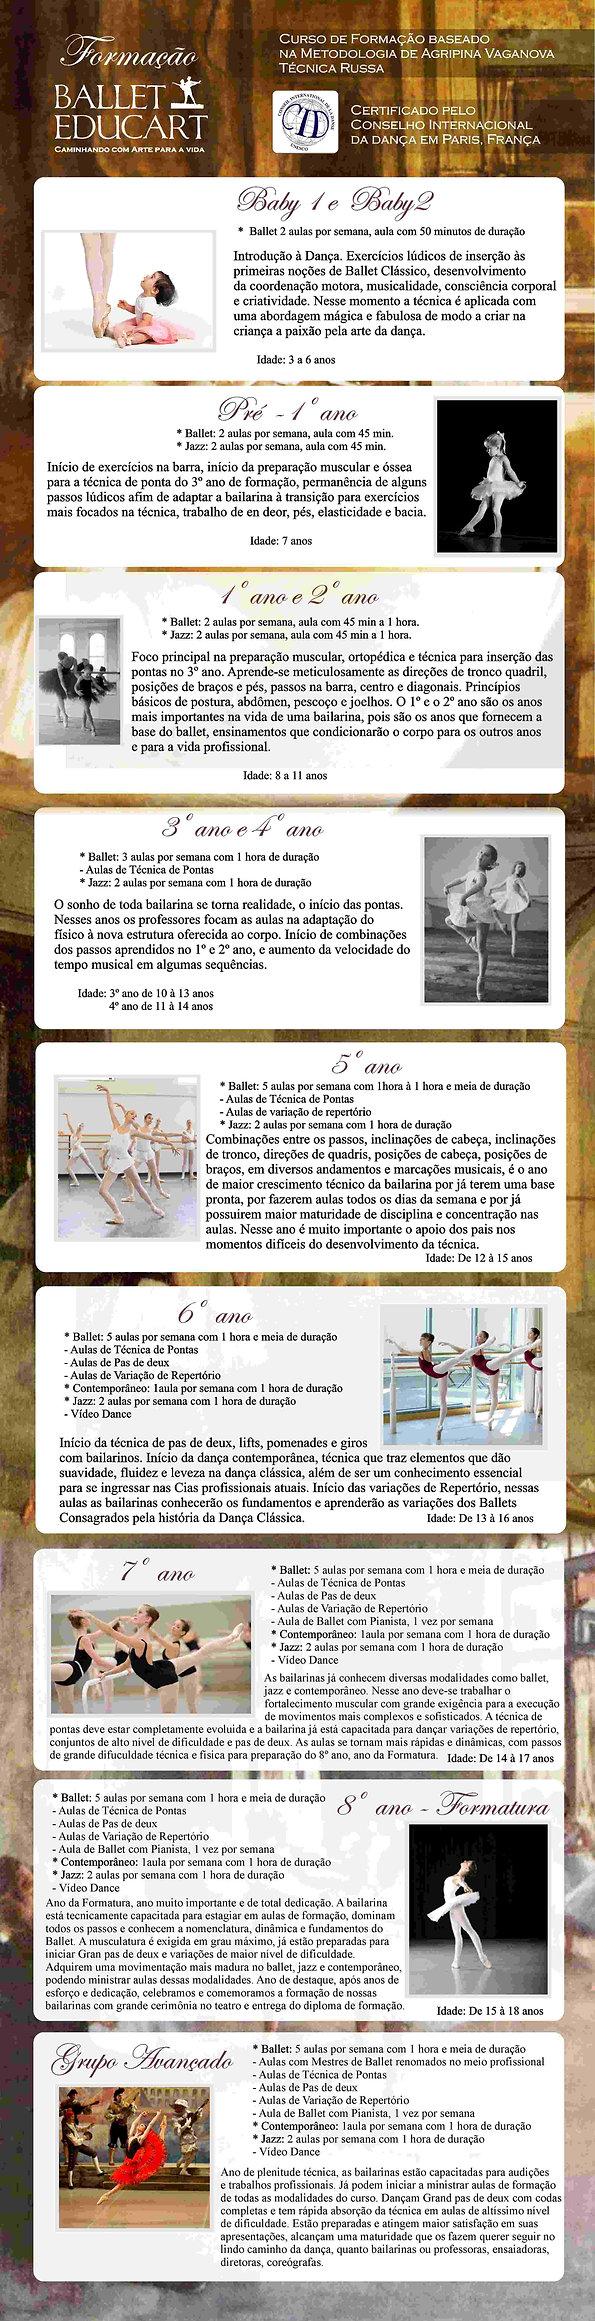 Formação Ballet Educart